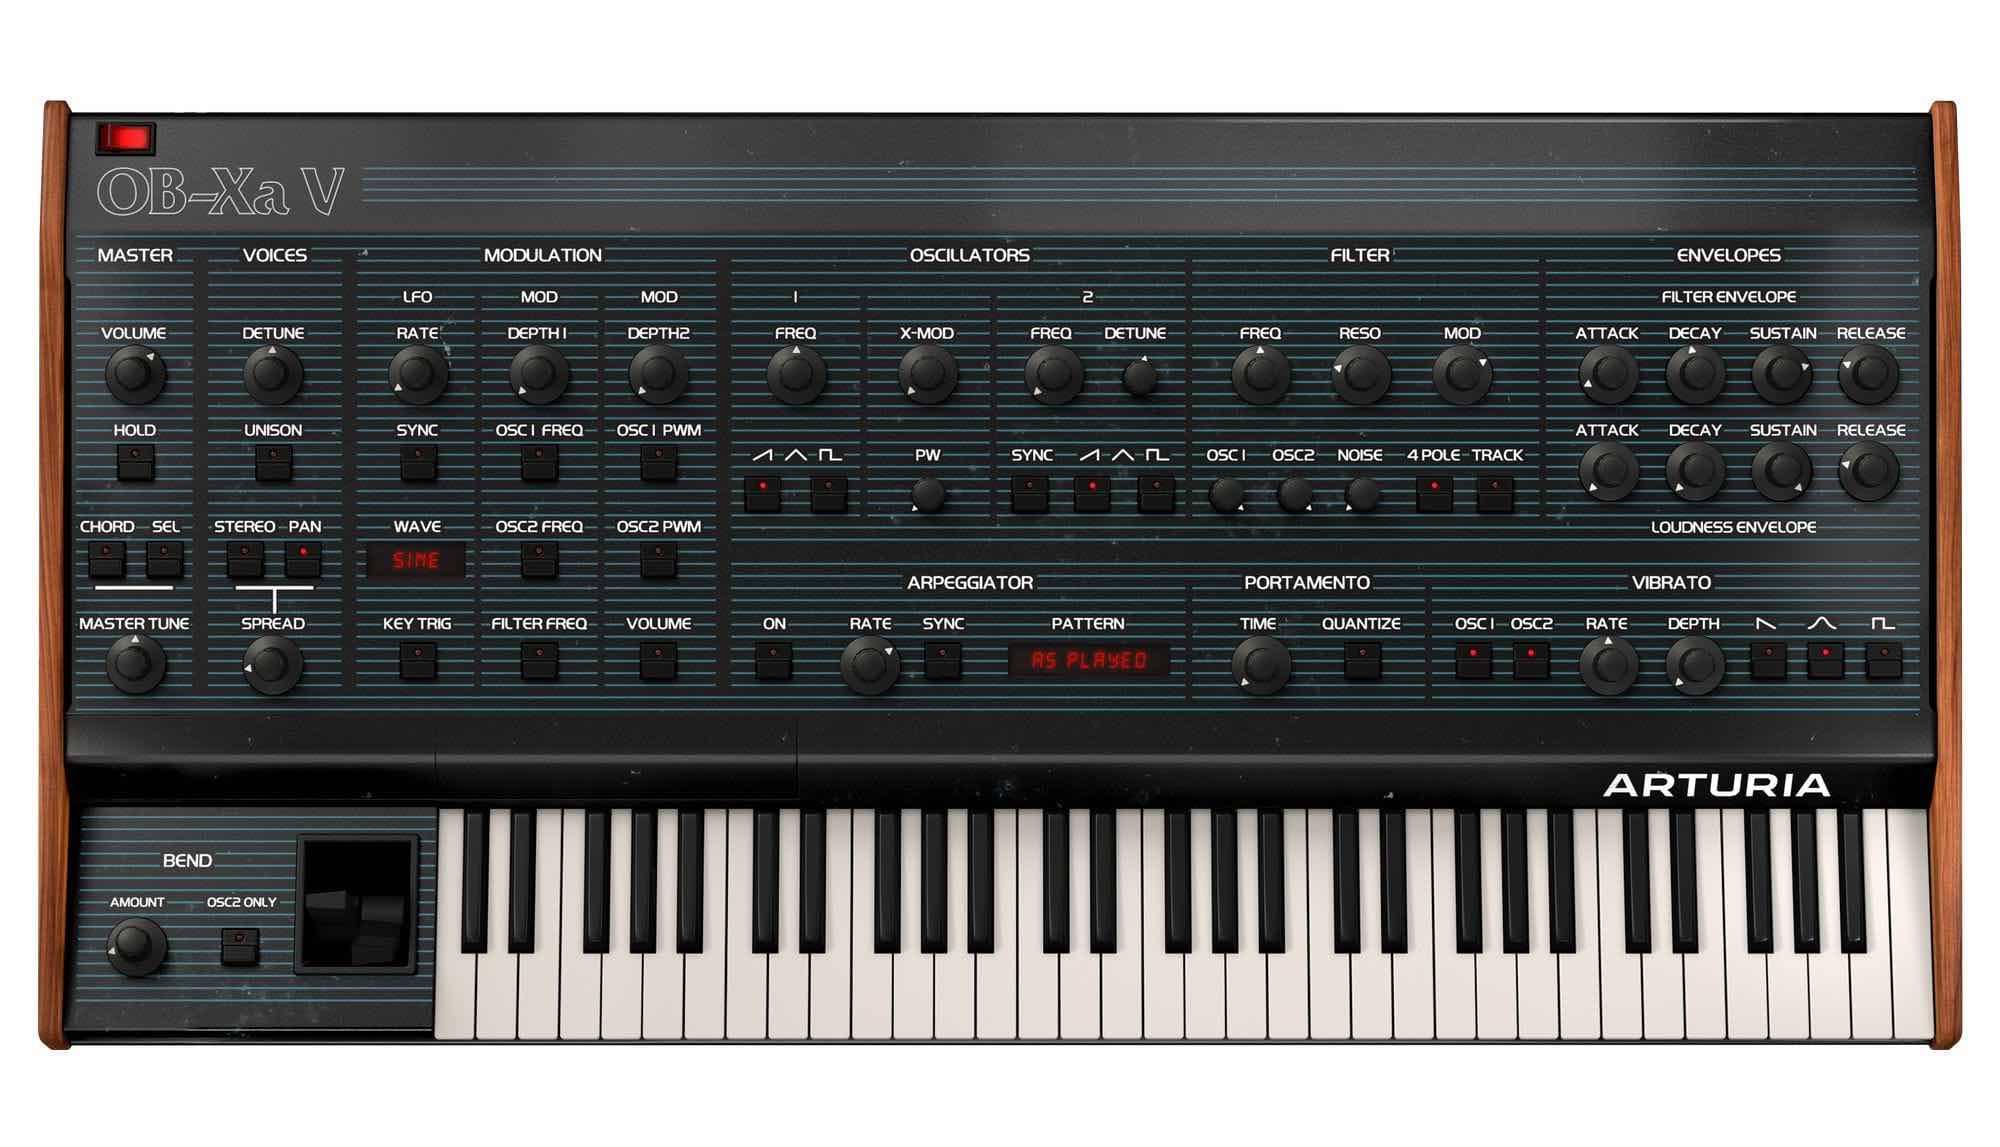 Arturia OB-Xa V synth soft virtual instrument sintetizzatore producer music daw midiware strumenti musicali